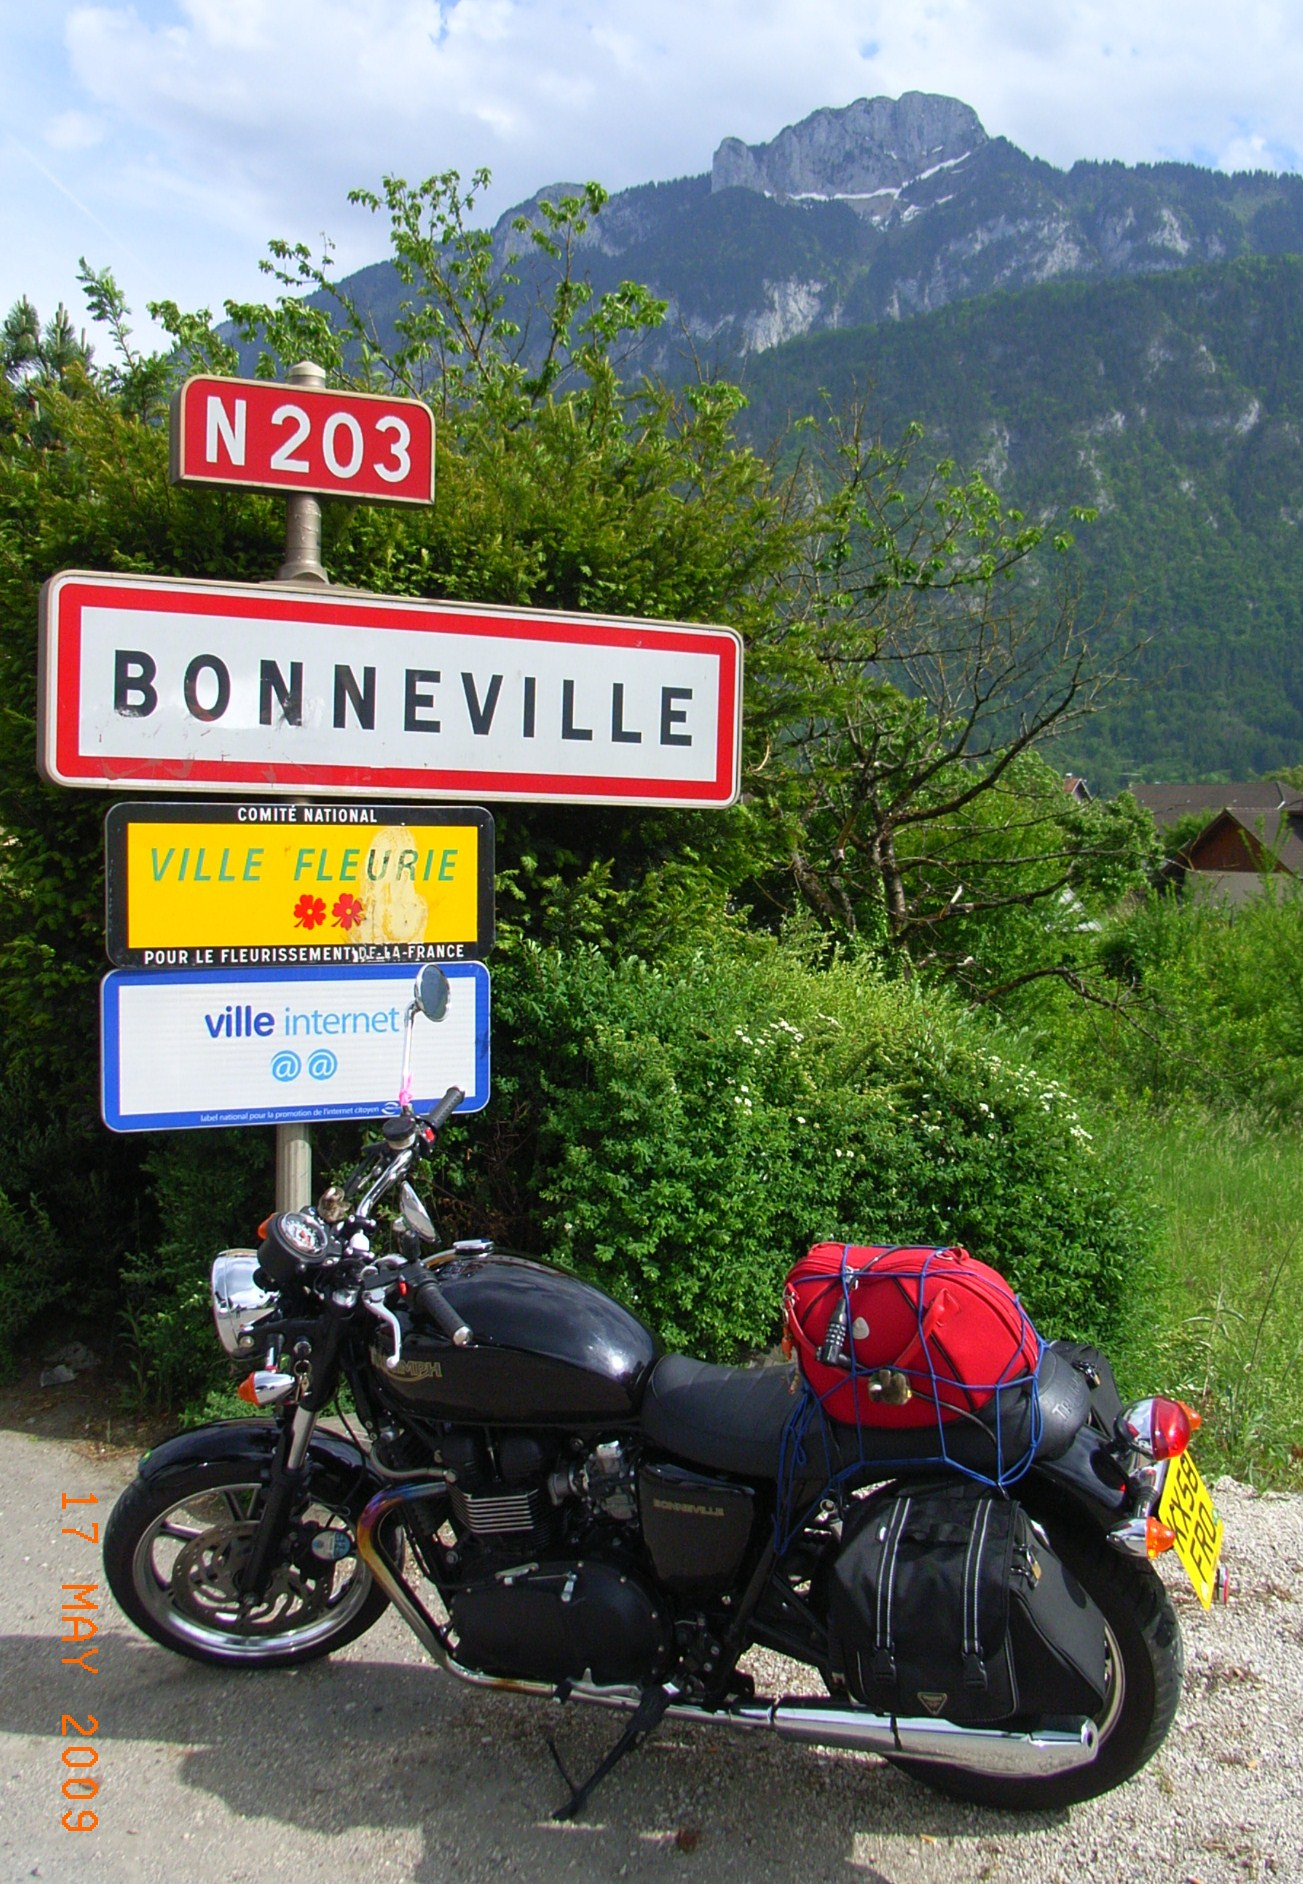 I made it to Bonneville, France.JPG